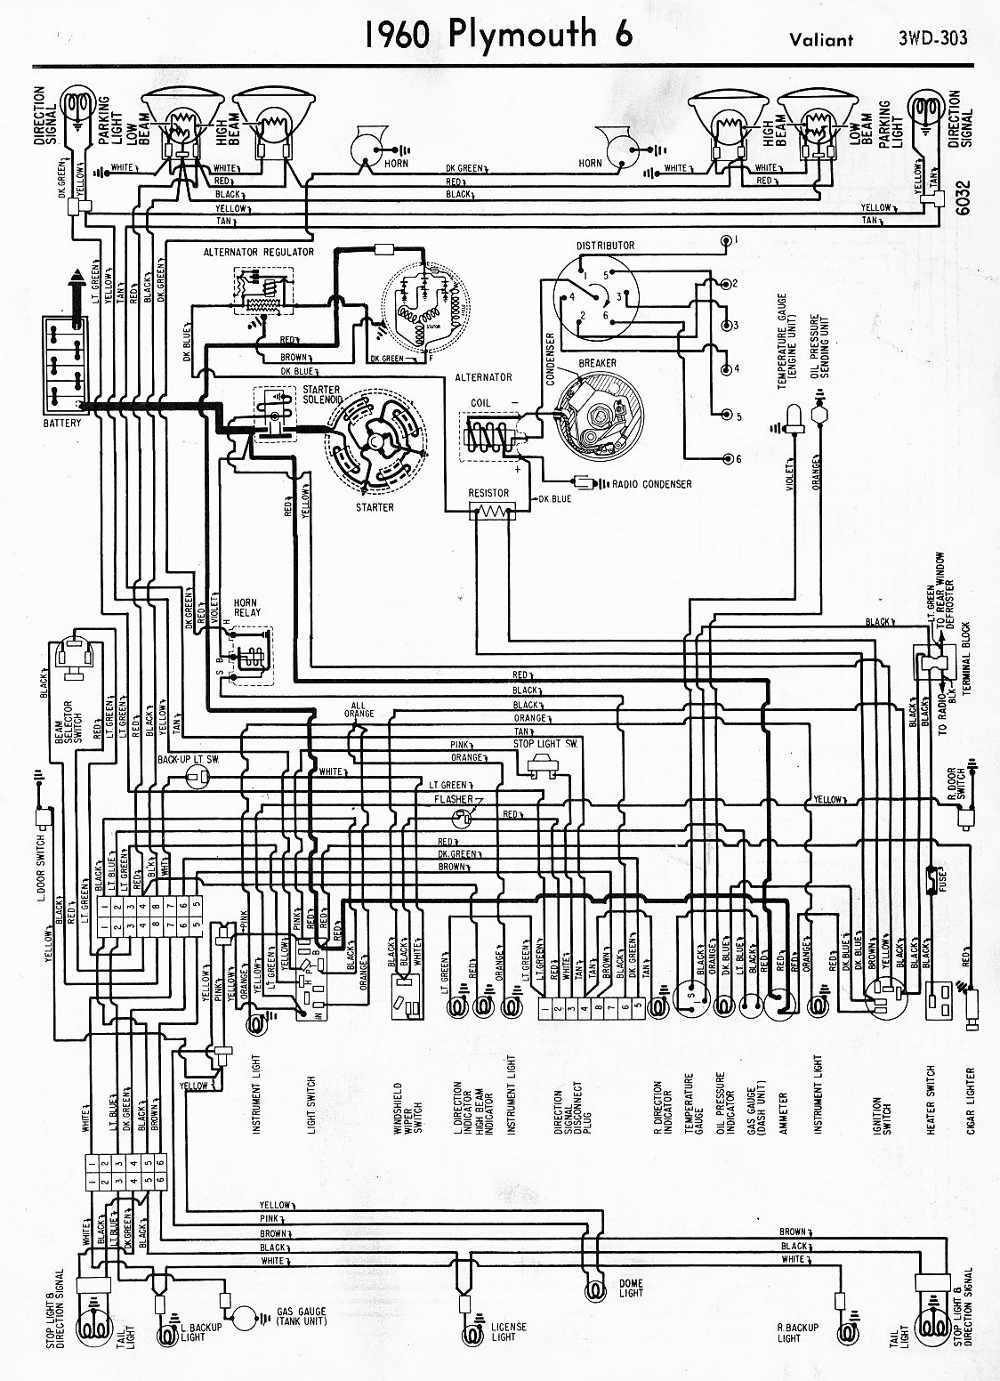 hight resolution of chrysler valiant wiring diagram simple wiring diagram dodge dakota wiring diagrams 1966 plymouth valiant wiring diagram